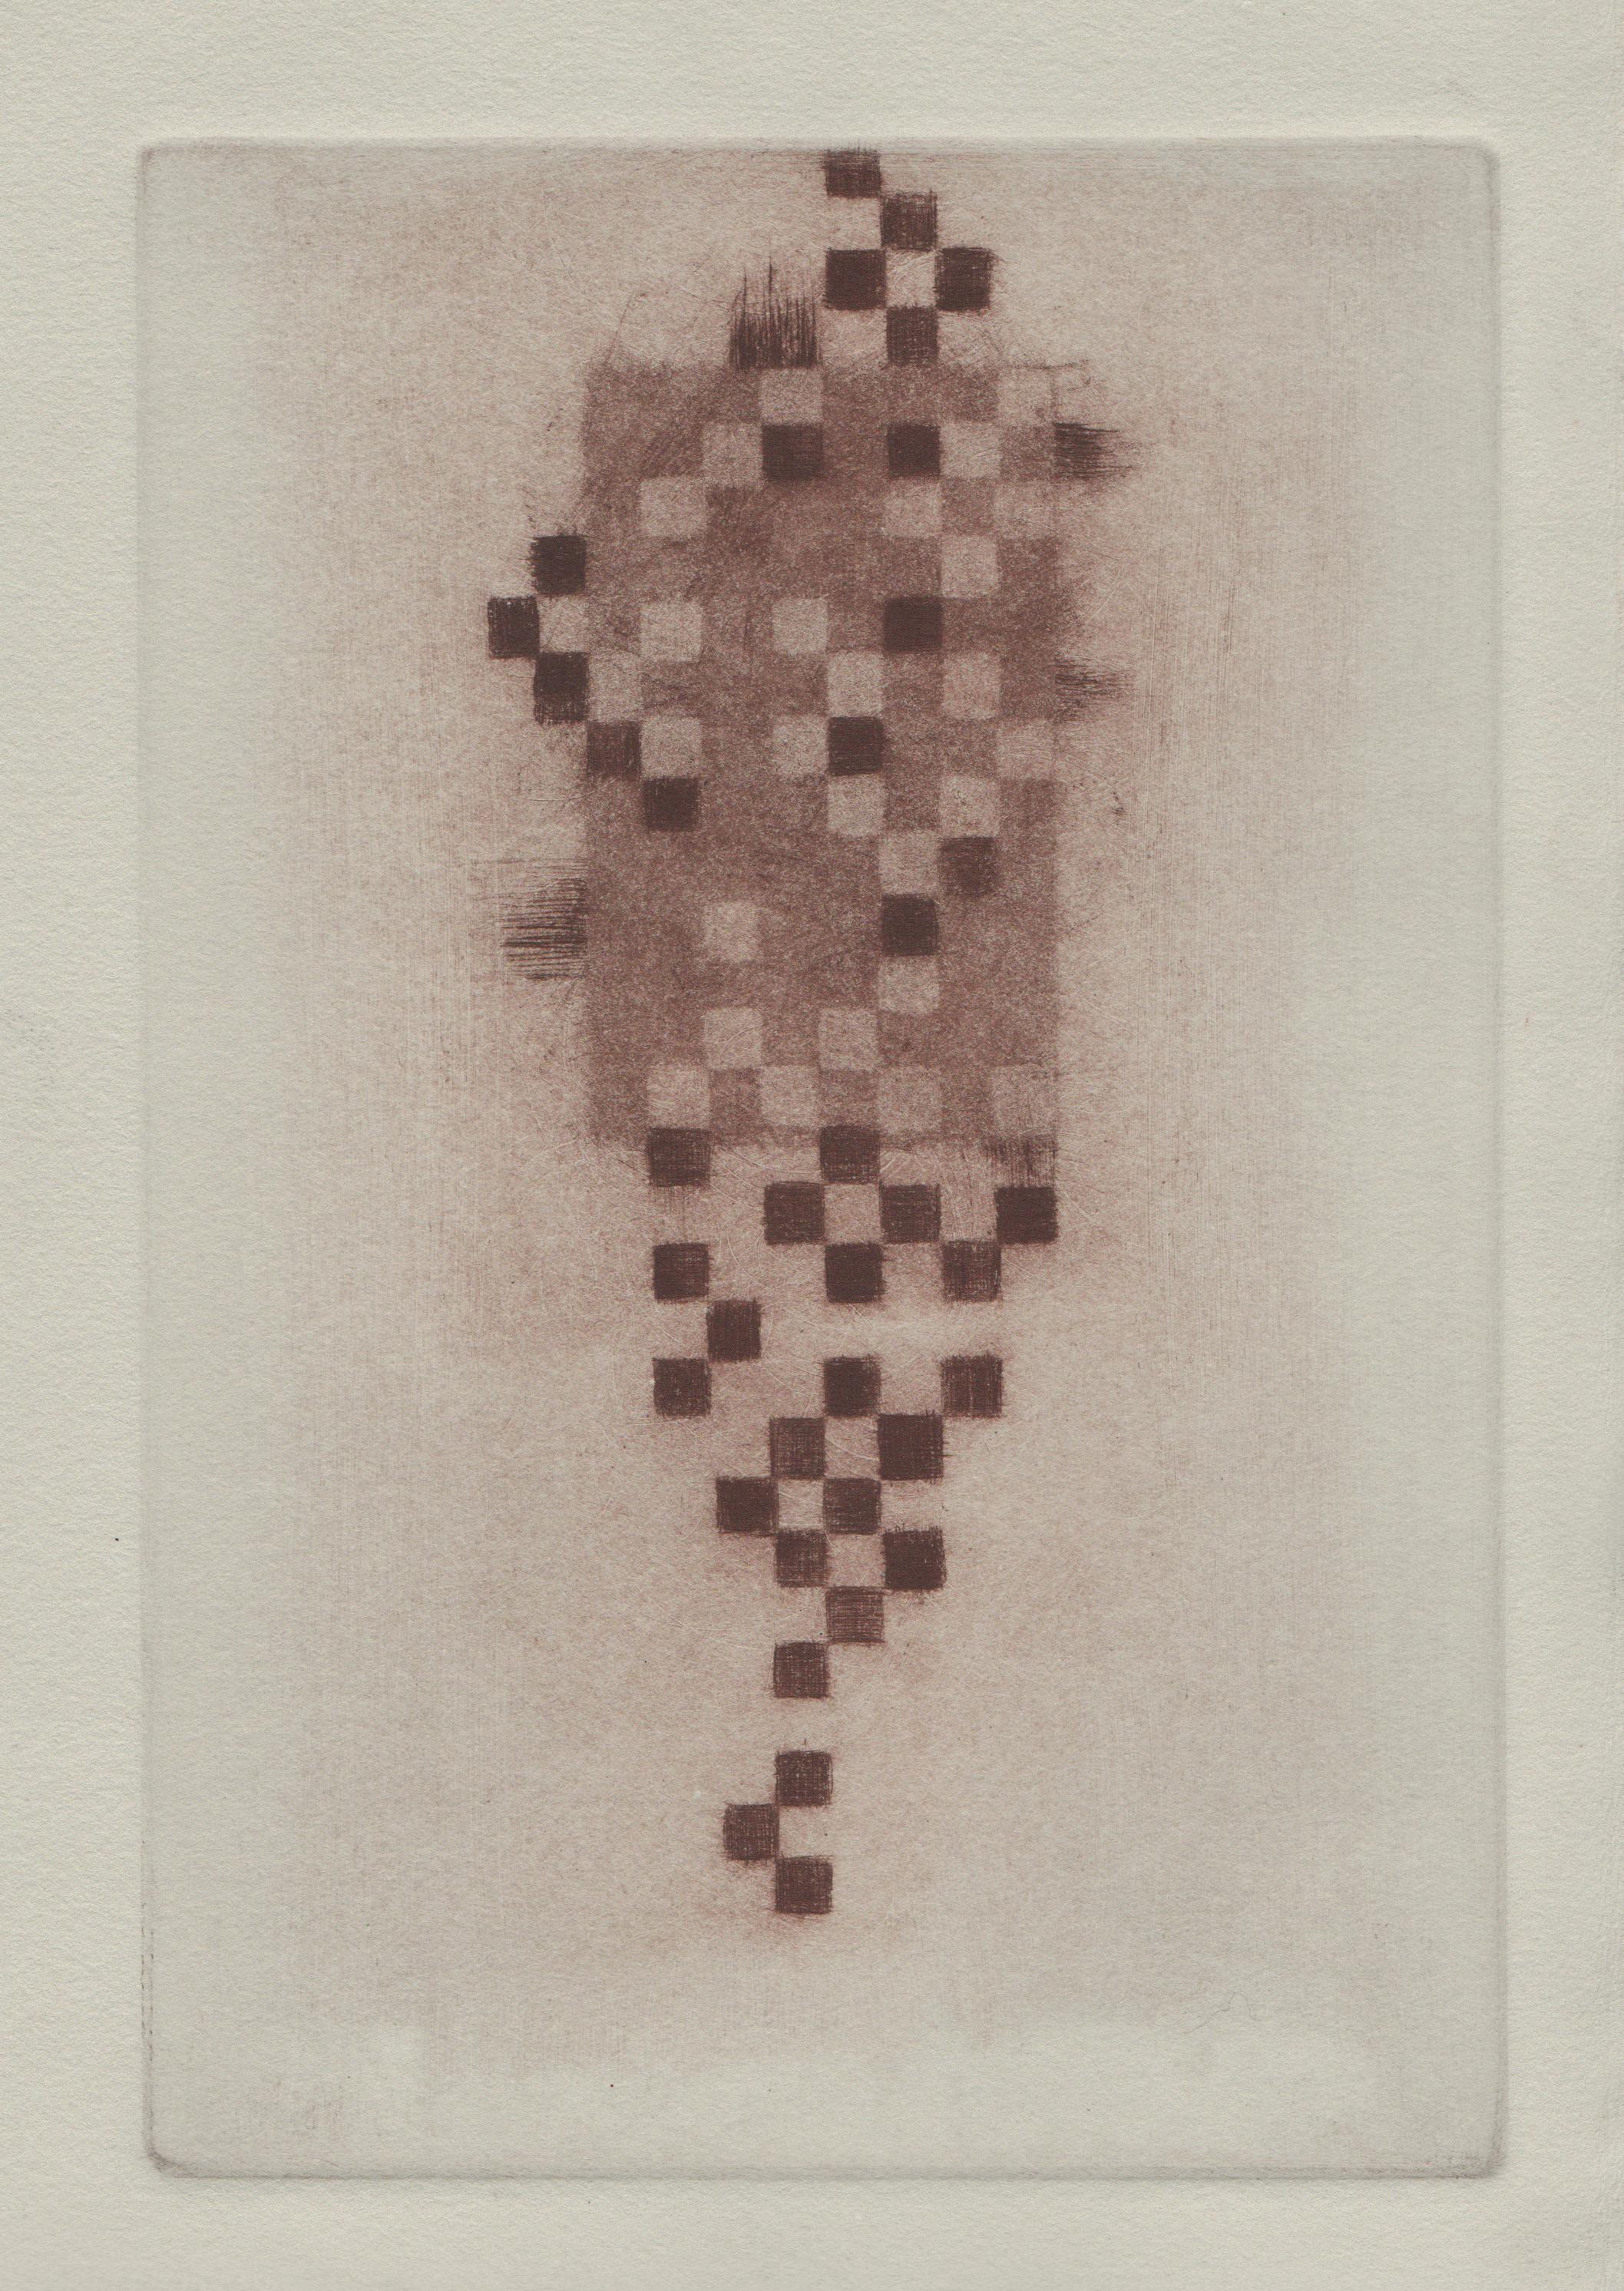 Dead Pixels, 2014, mezzotint and drypoint, 14x11in